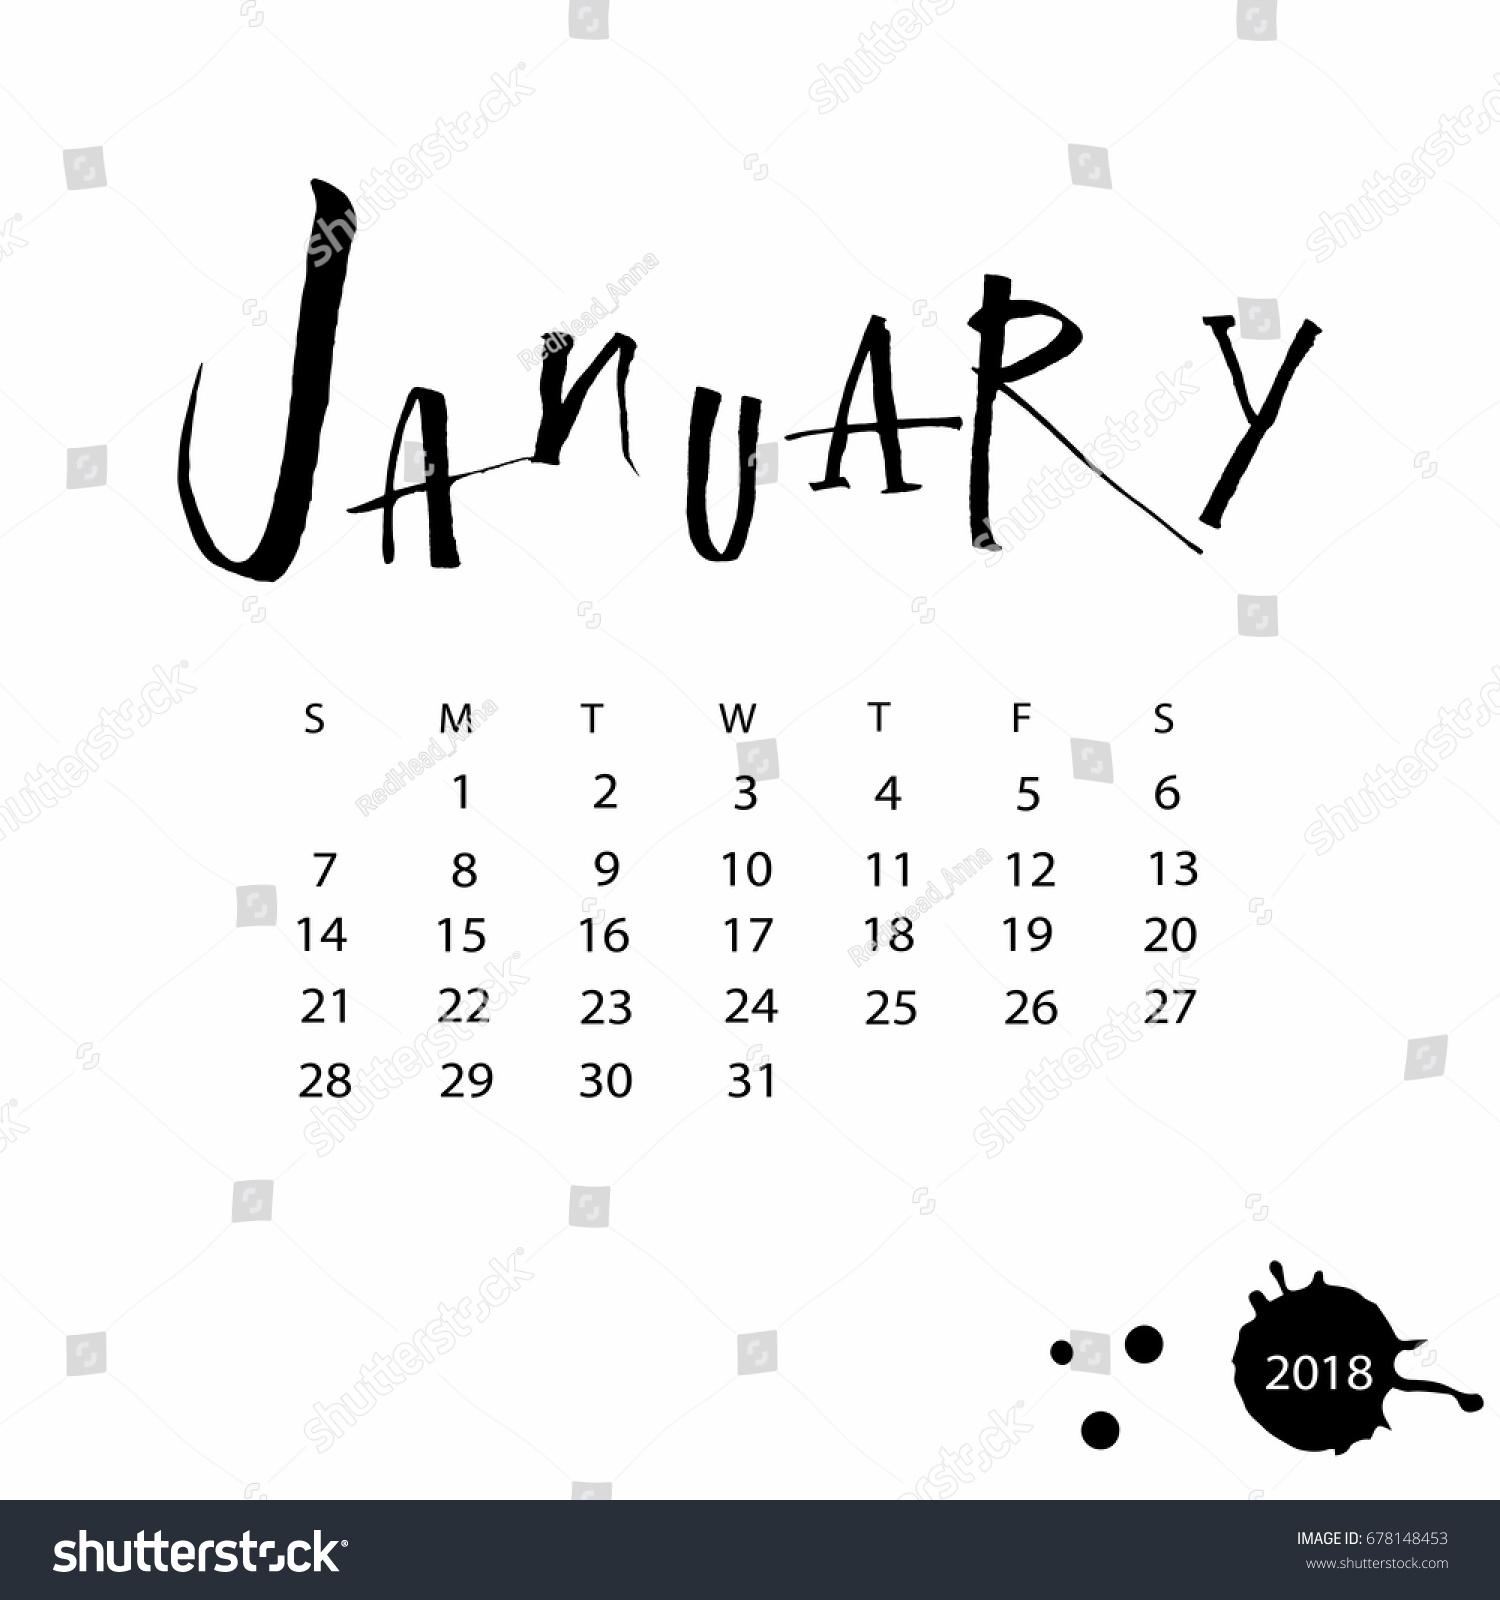 Calendar Design Letters : Vector calendar january hand drawn stock